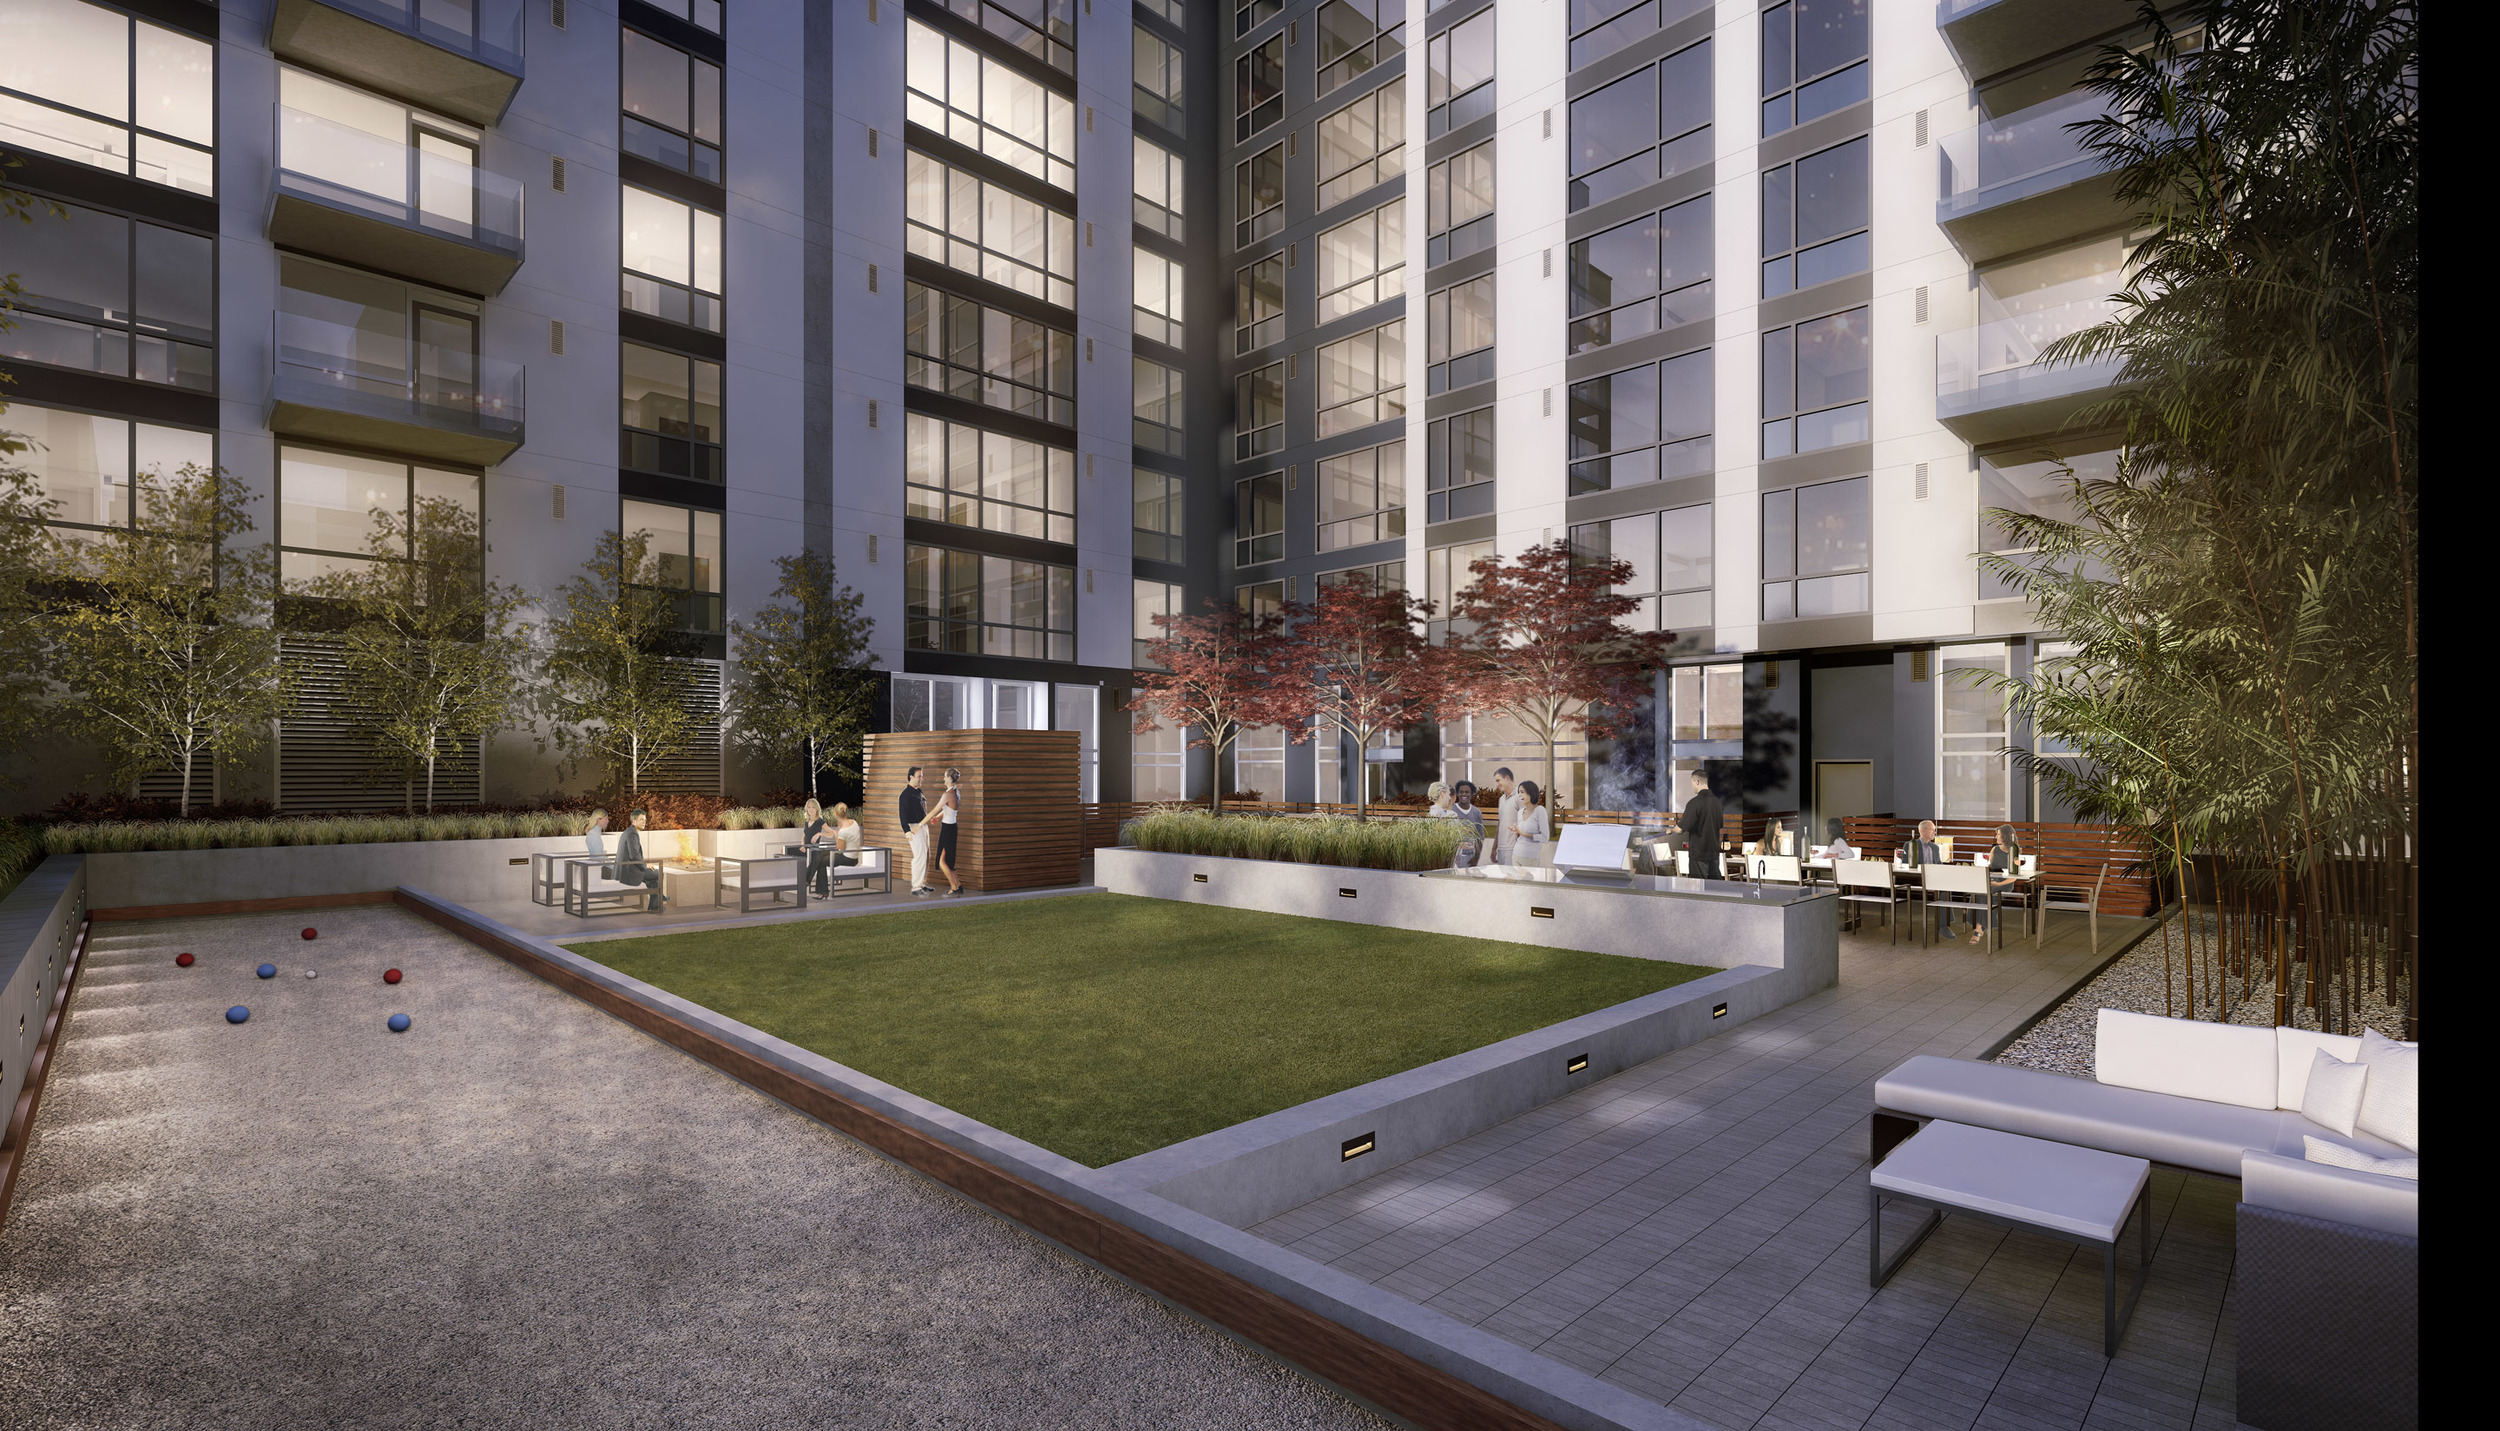 12172_Marlow_Courtyard_ViewA01_HR01.jpg